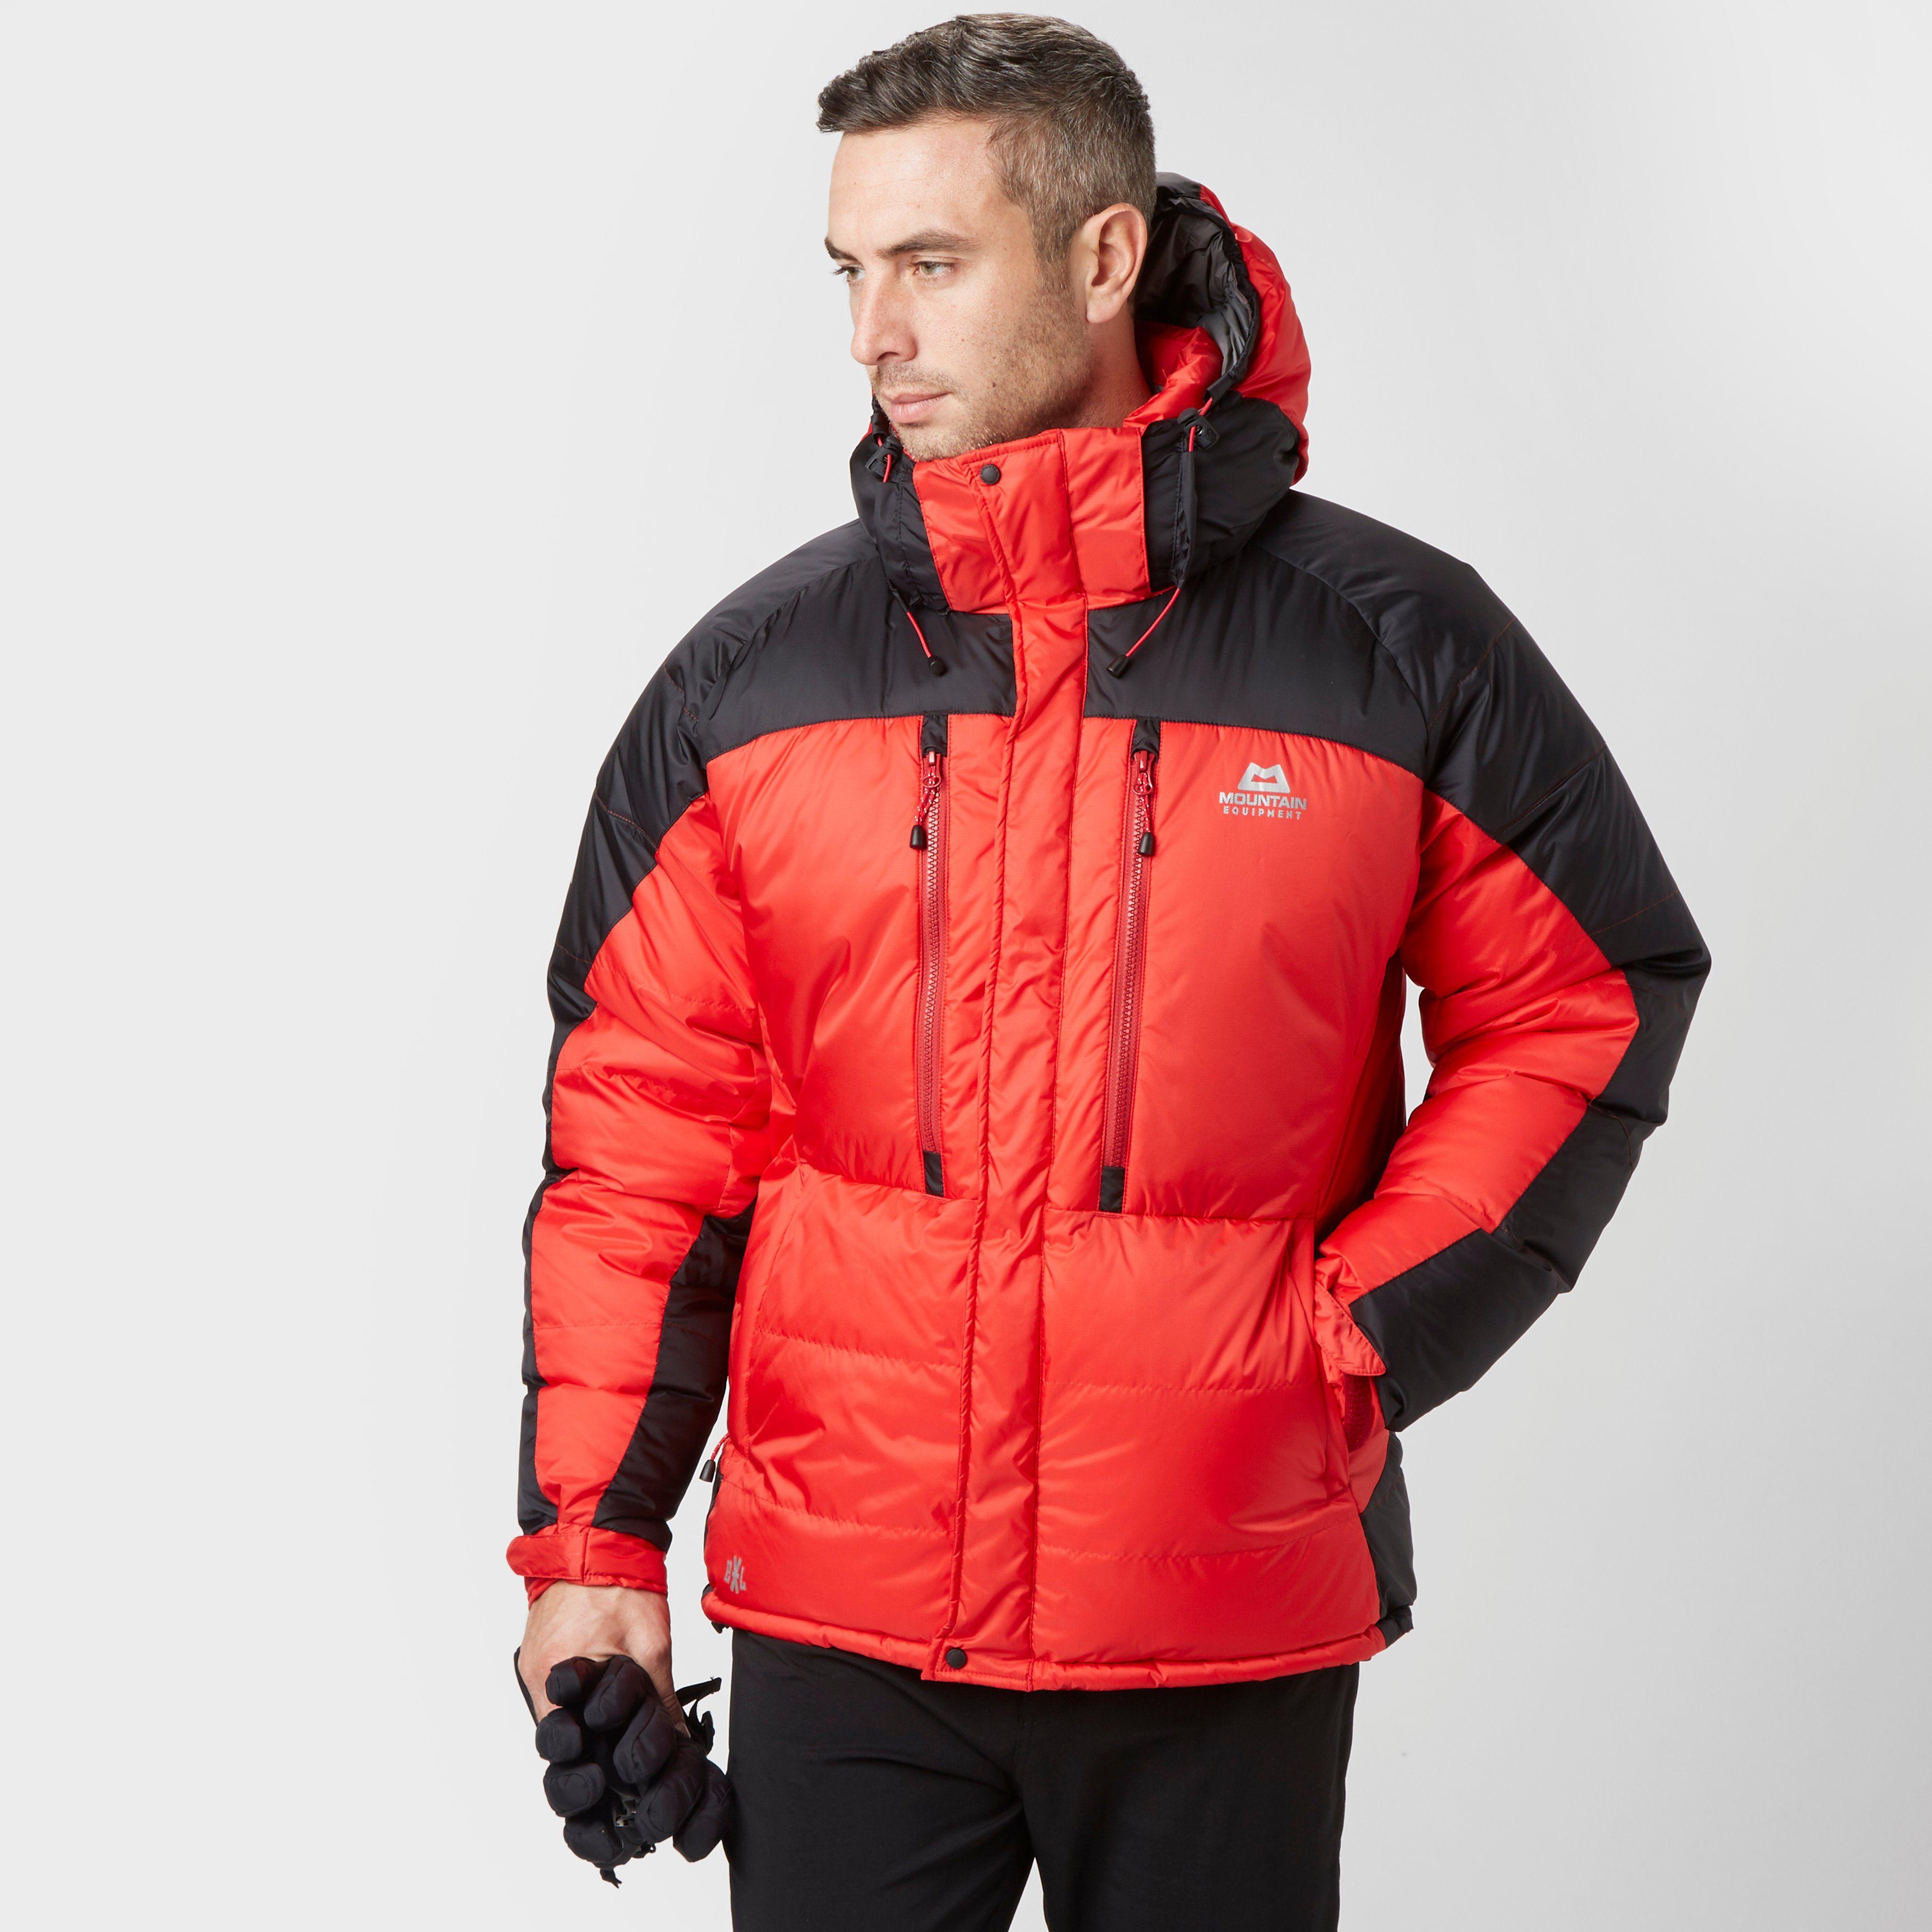 MOUNTAIN EQUIPMENT Men's Annapurna Down Jacket